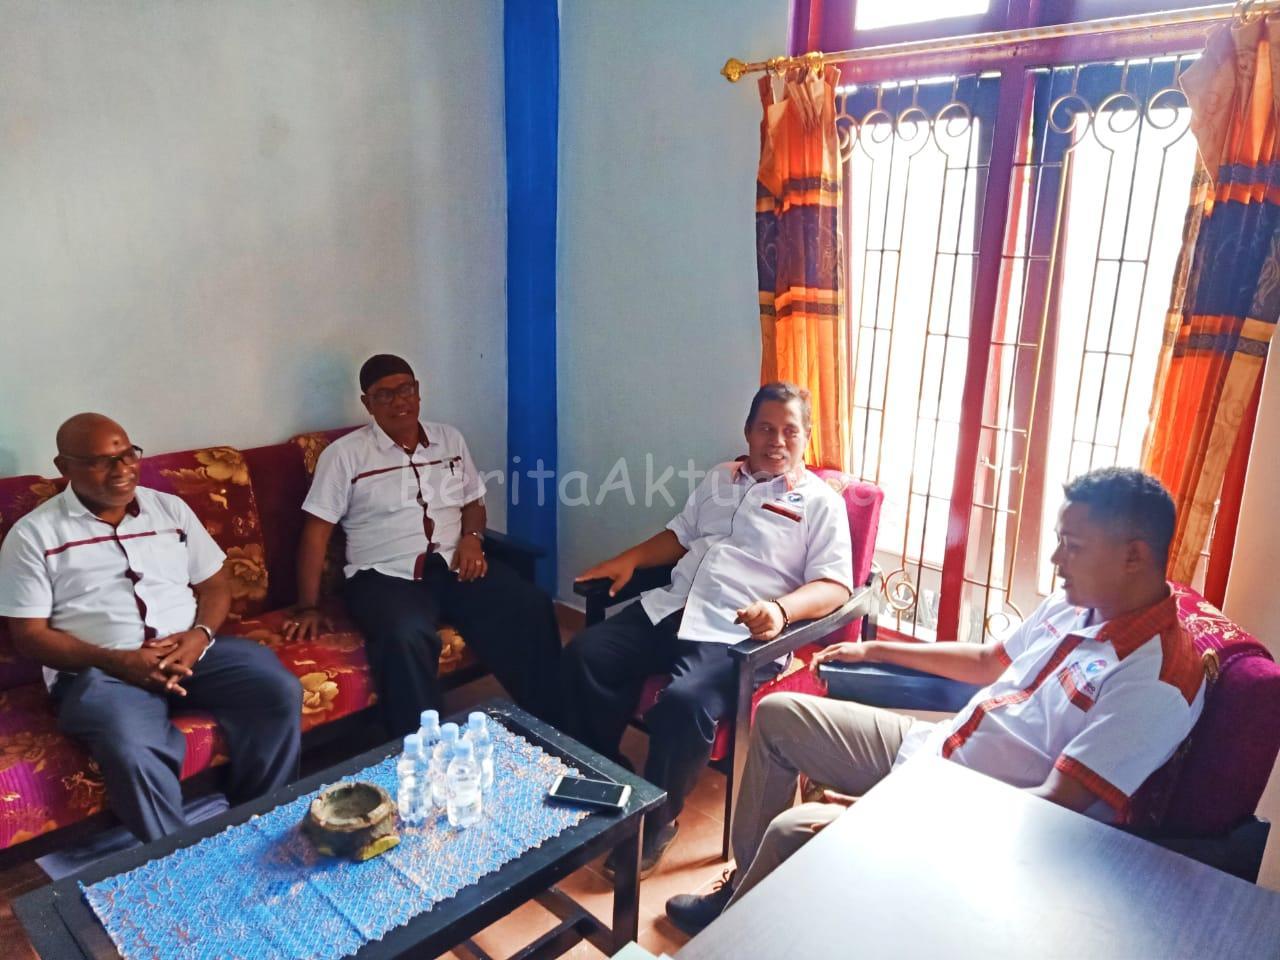 Siap Maju Pilkada 2020, Pasangan BW Mendaftar di DPD Perindo Manokwari 24 IMG 20200708 WA0039